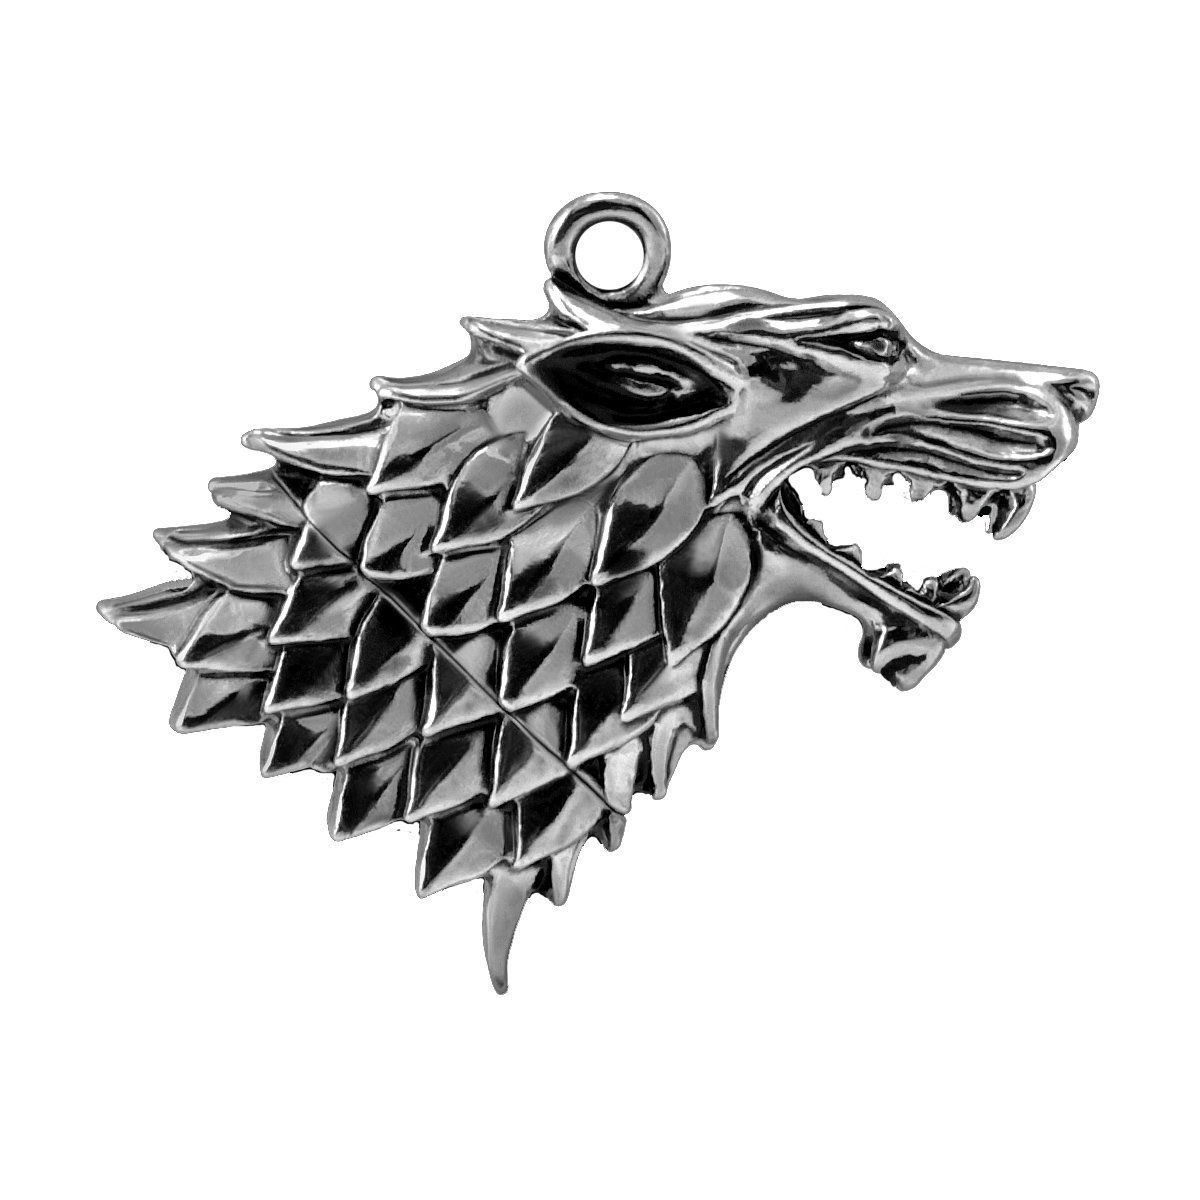 16GB Game of Thrones Direwolf USB Flash Drive